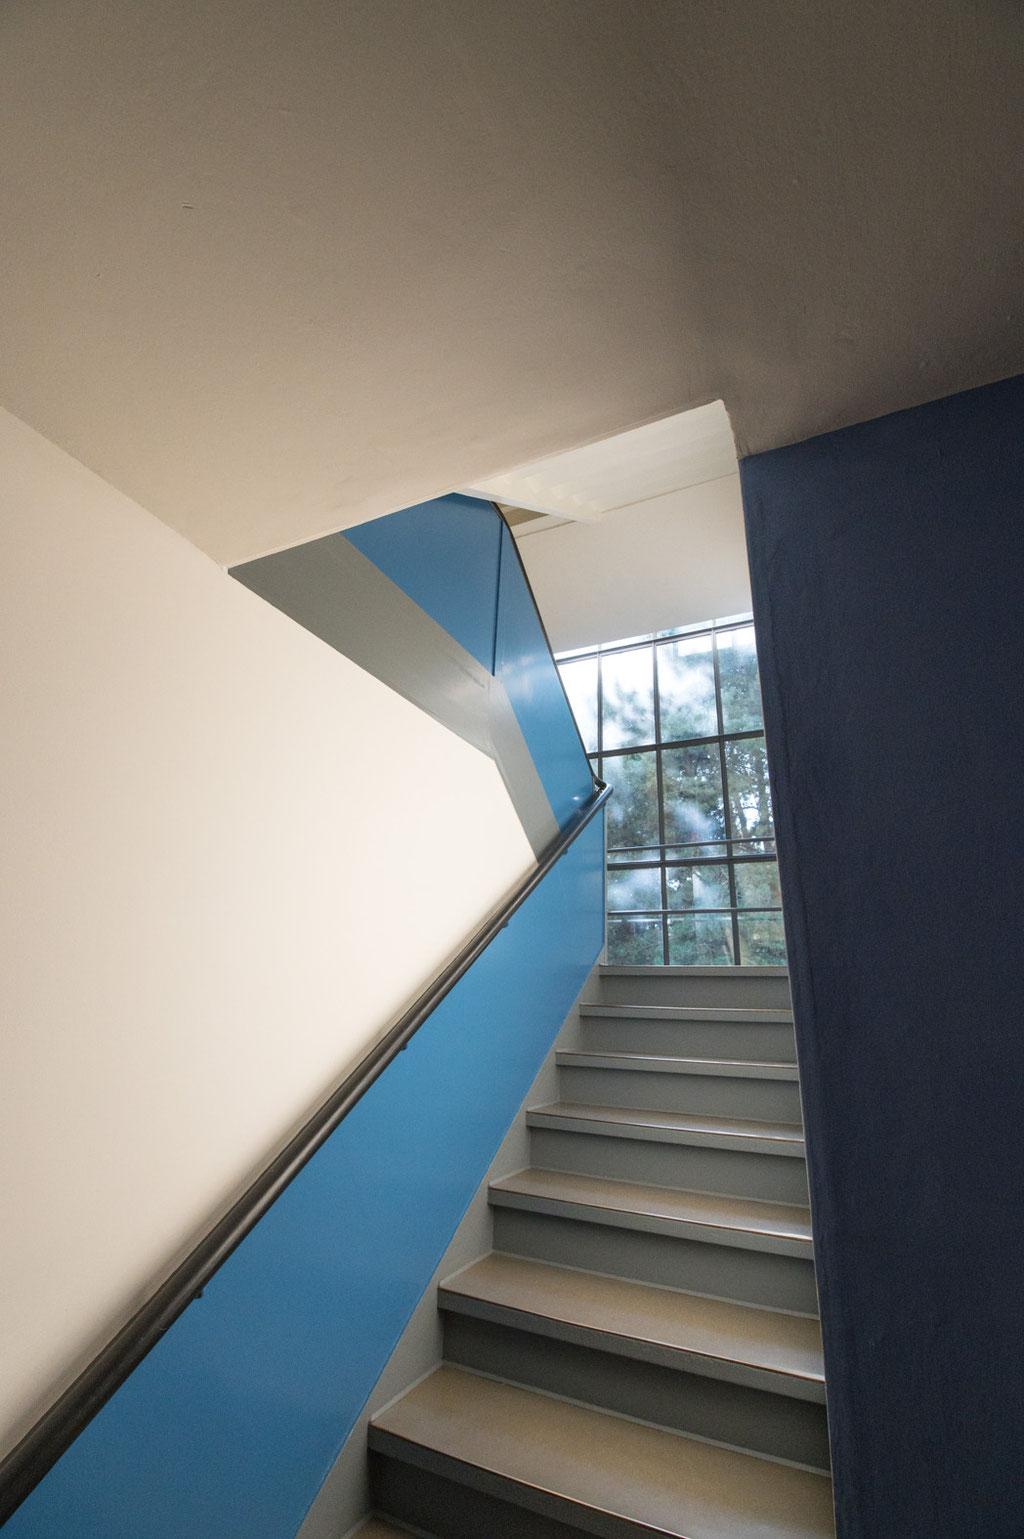 Treppe Meisterhäuser (Walter Gropius), Dessau (D)